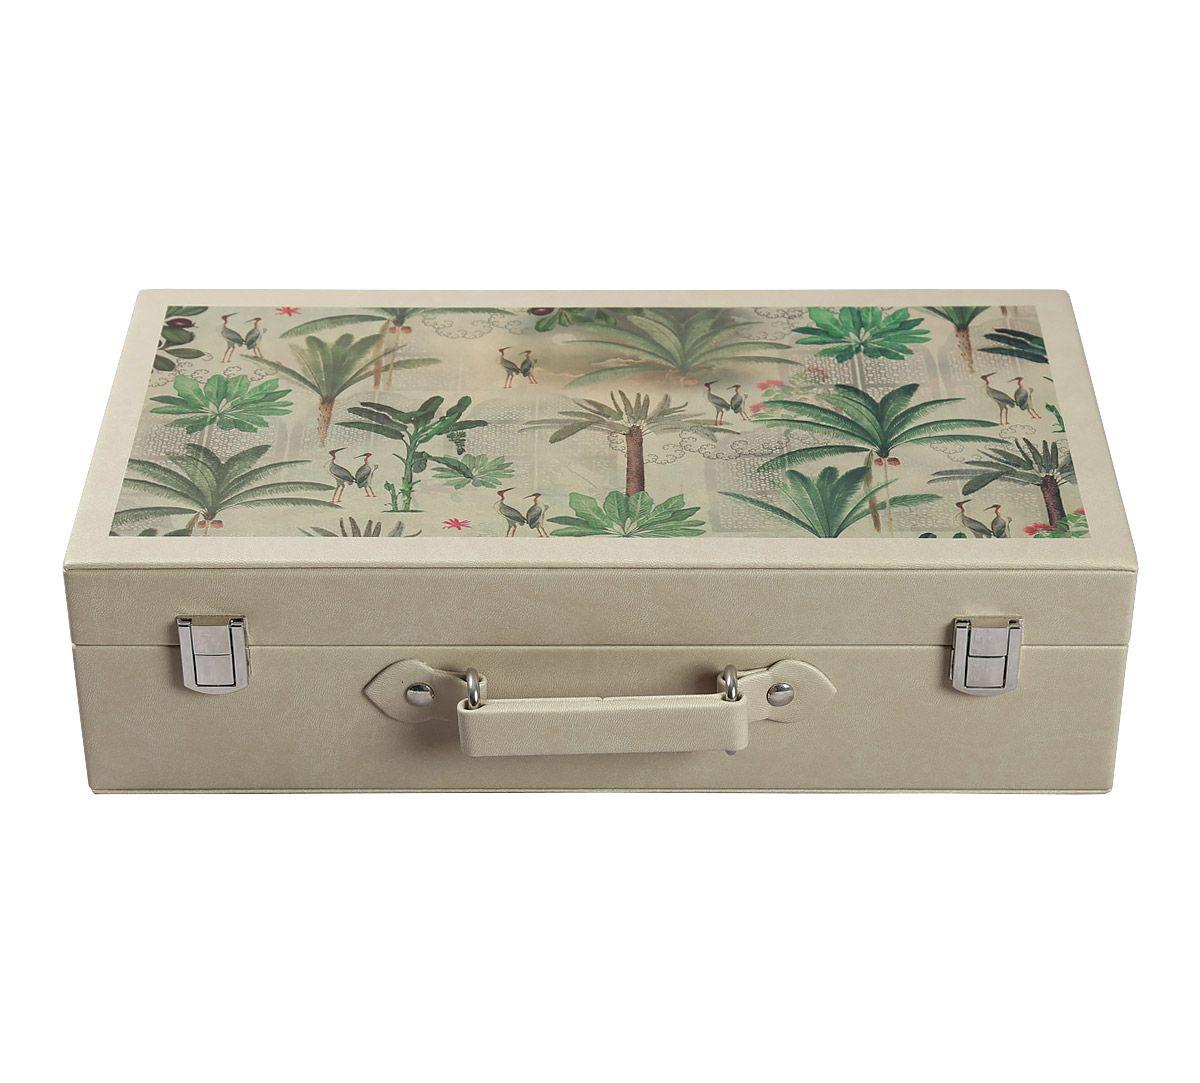 India Circus Heron's Garden Leather Watch and Eyewear Box